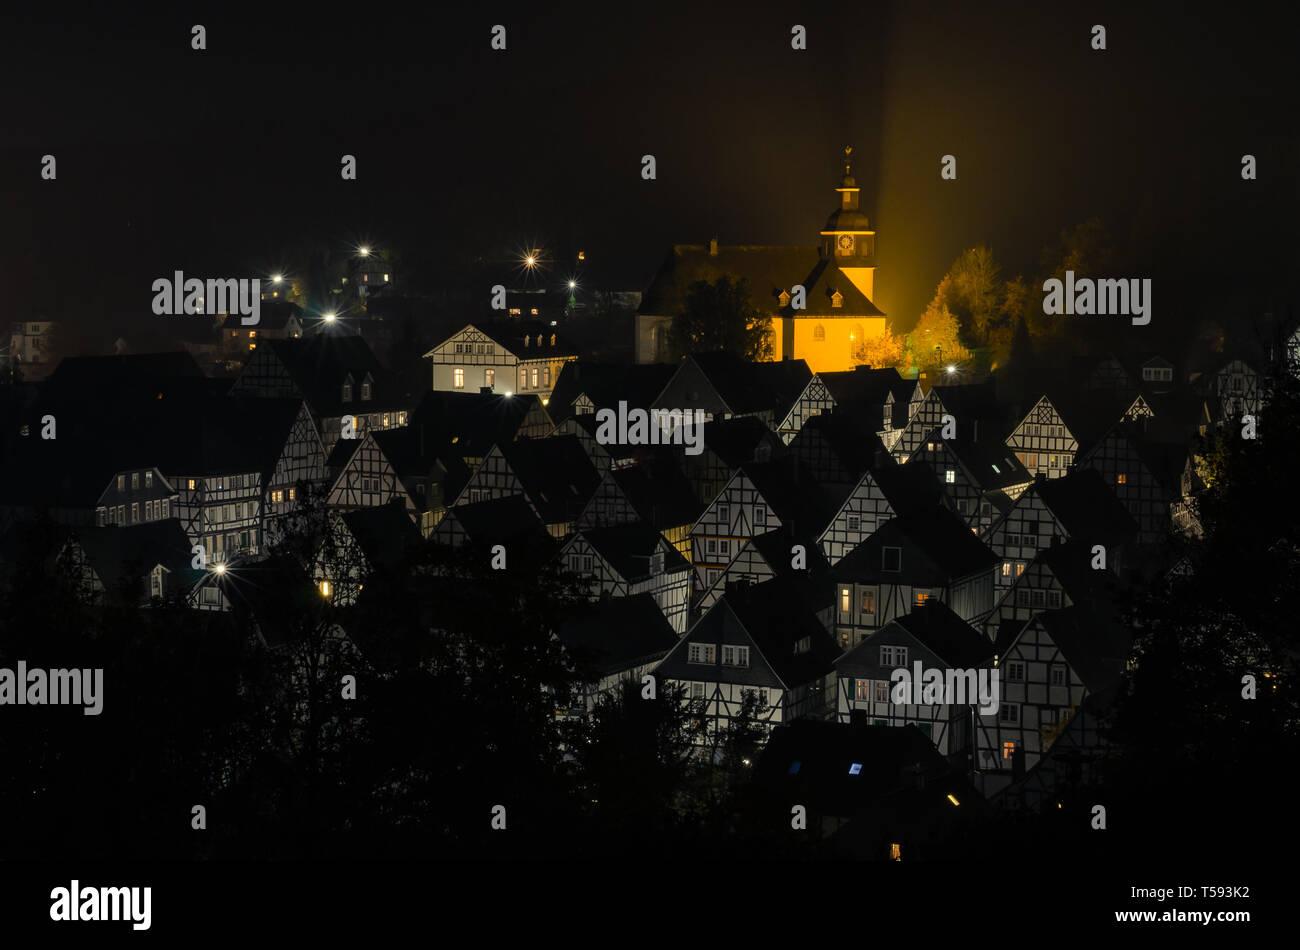 Freudenberg bei Nacht - Stock Image